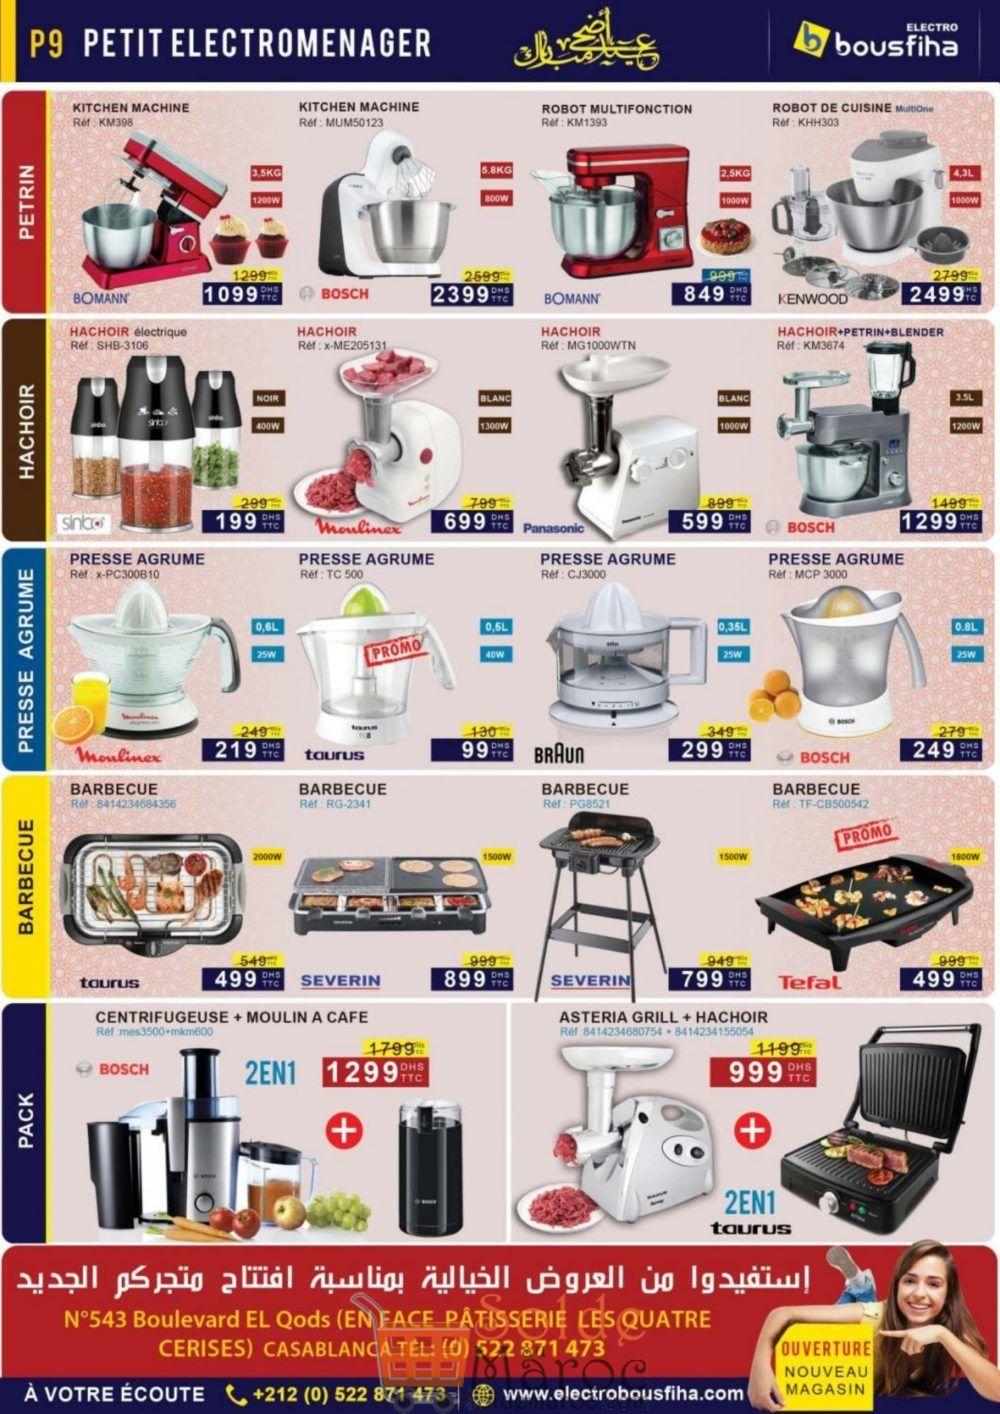 Catalogue Electro Bousfiha Spéciale عيد الأضحى du 8 Août au 10 Septembre 2018